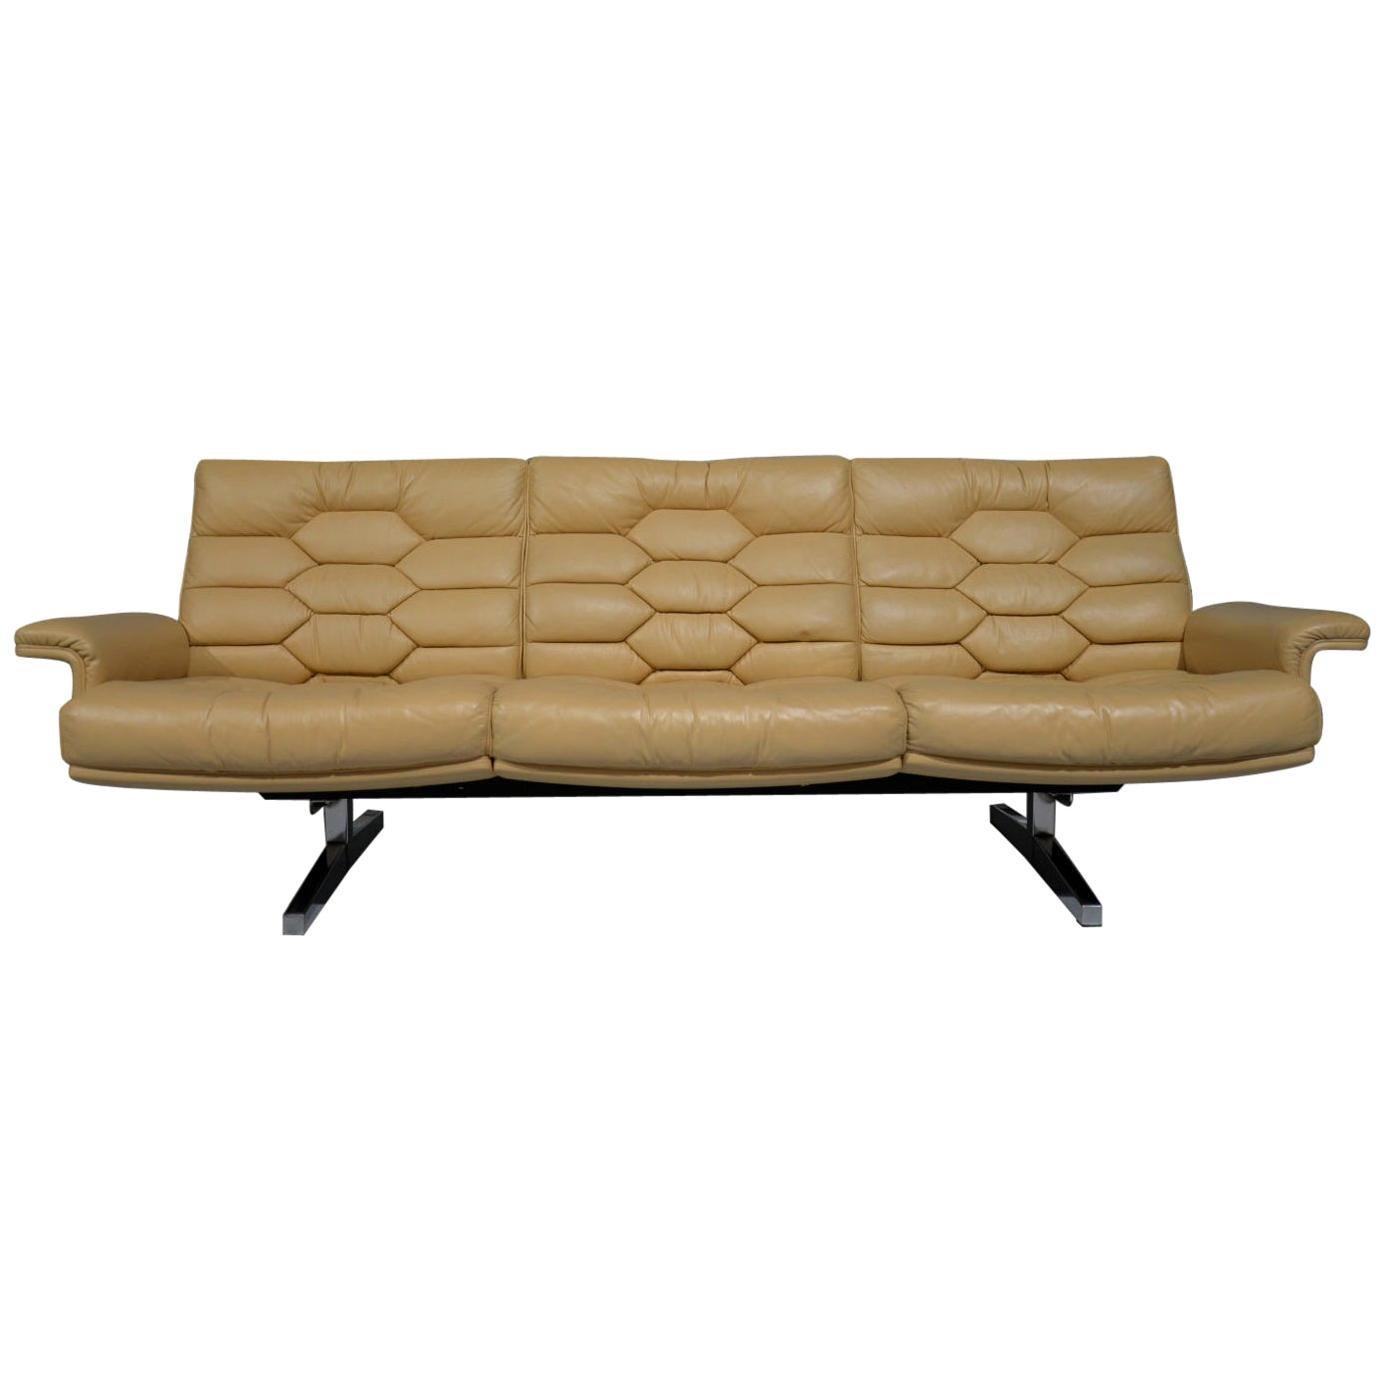 Vintage De Sede Leather DS-P Sofa by Robert Haussmann, Switzerland, 1970s